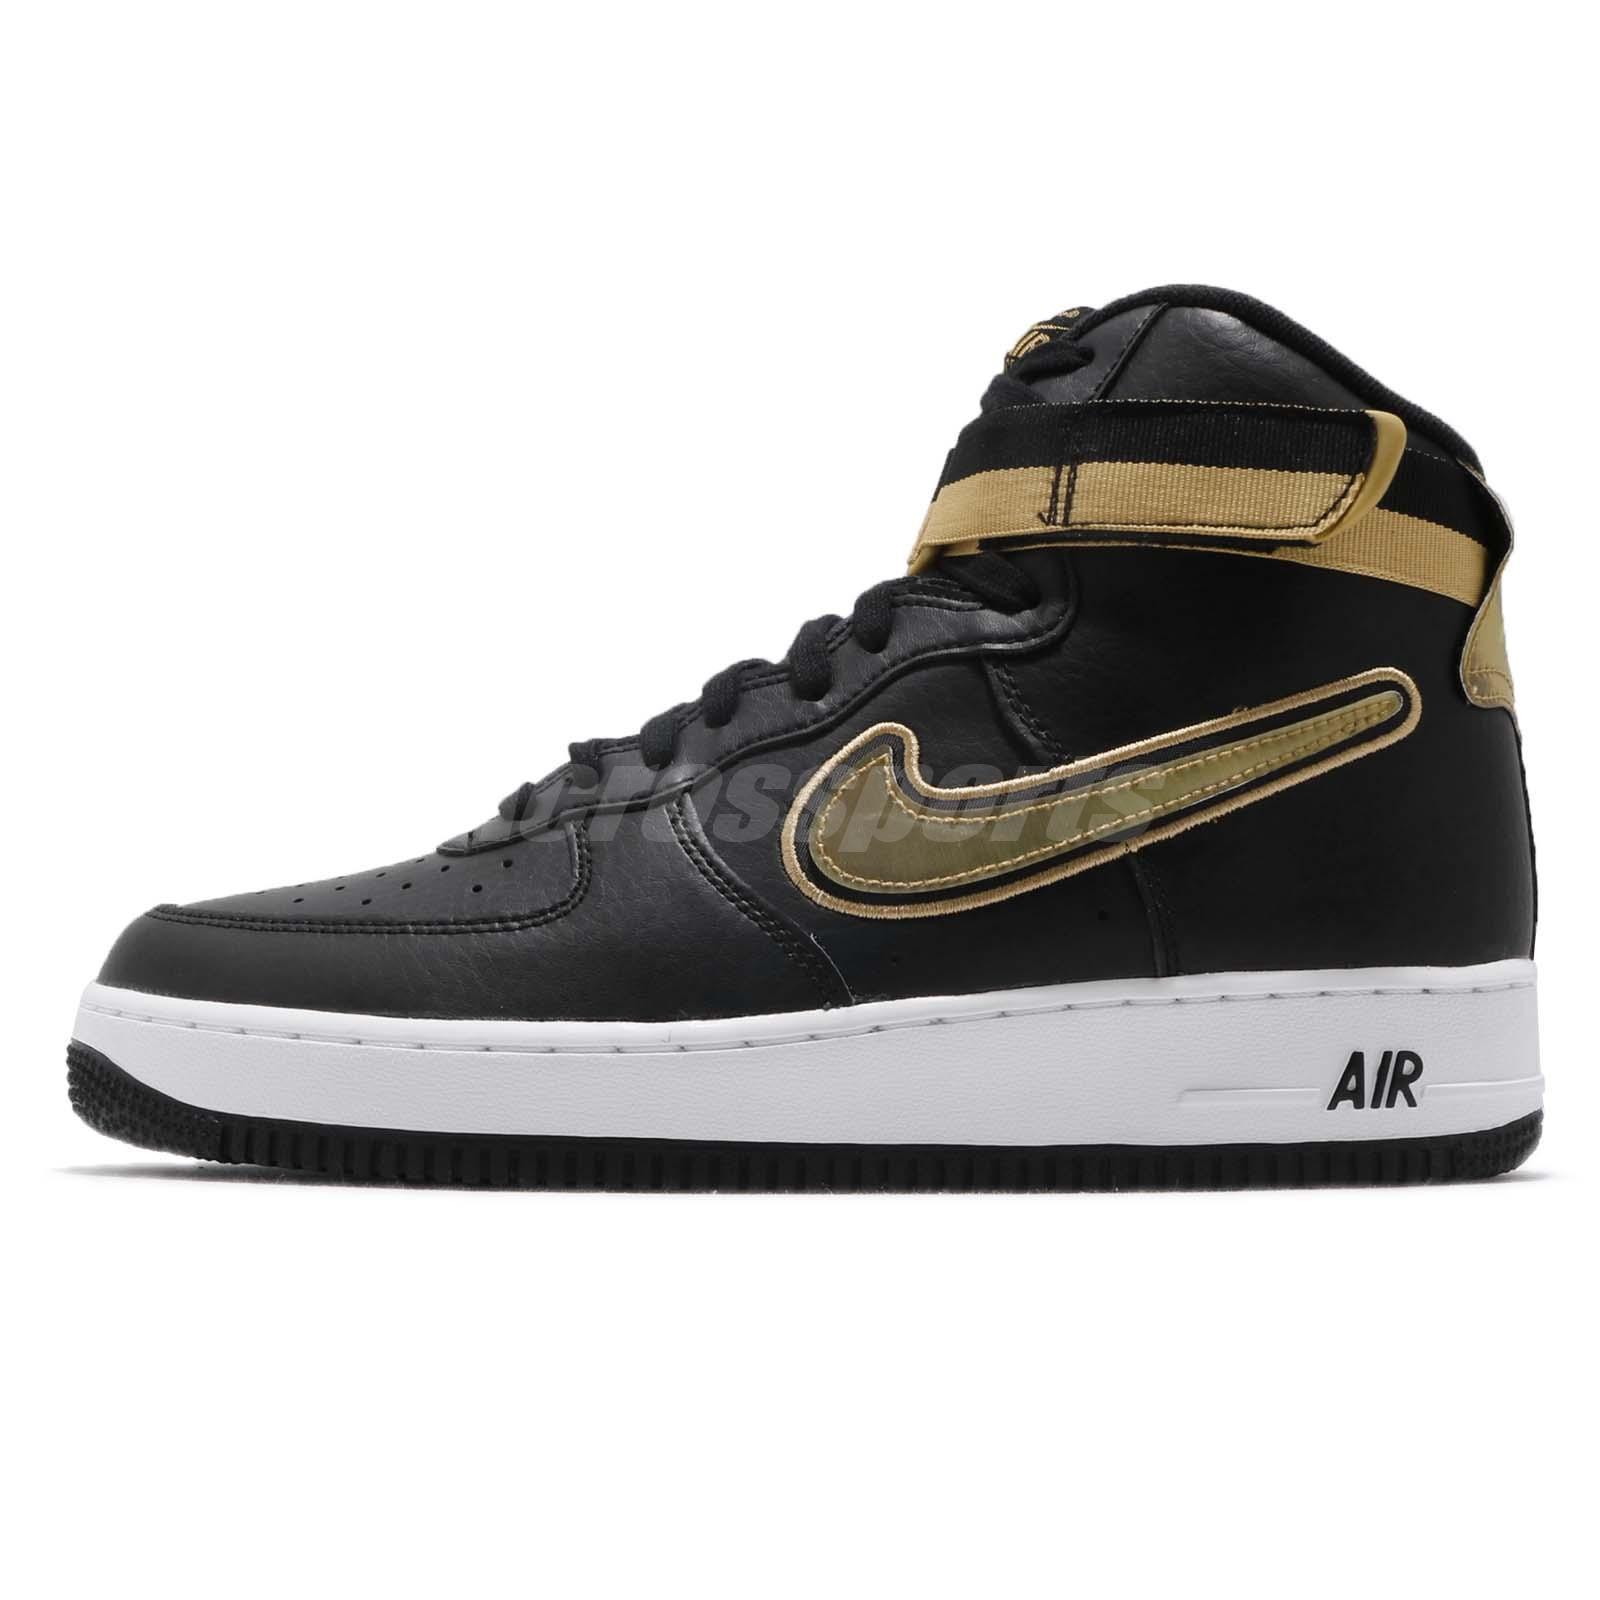 4f7449aefbc7 Nike Air Force 1 High 07 LV8 Sport NBA Black Metallic Gold AF1 Men  AV3938-001